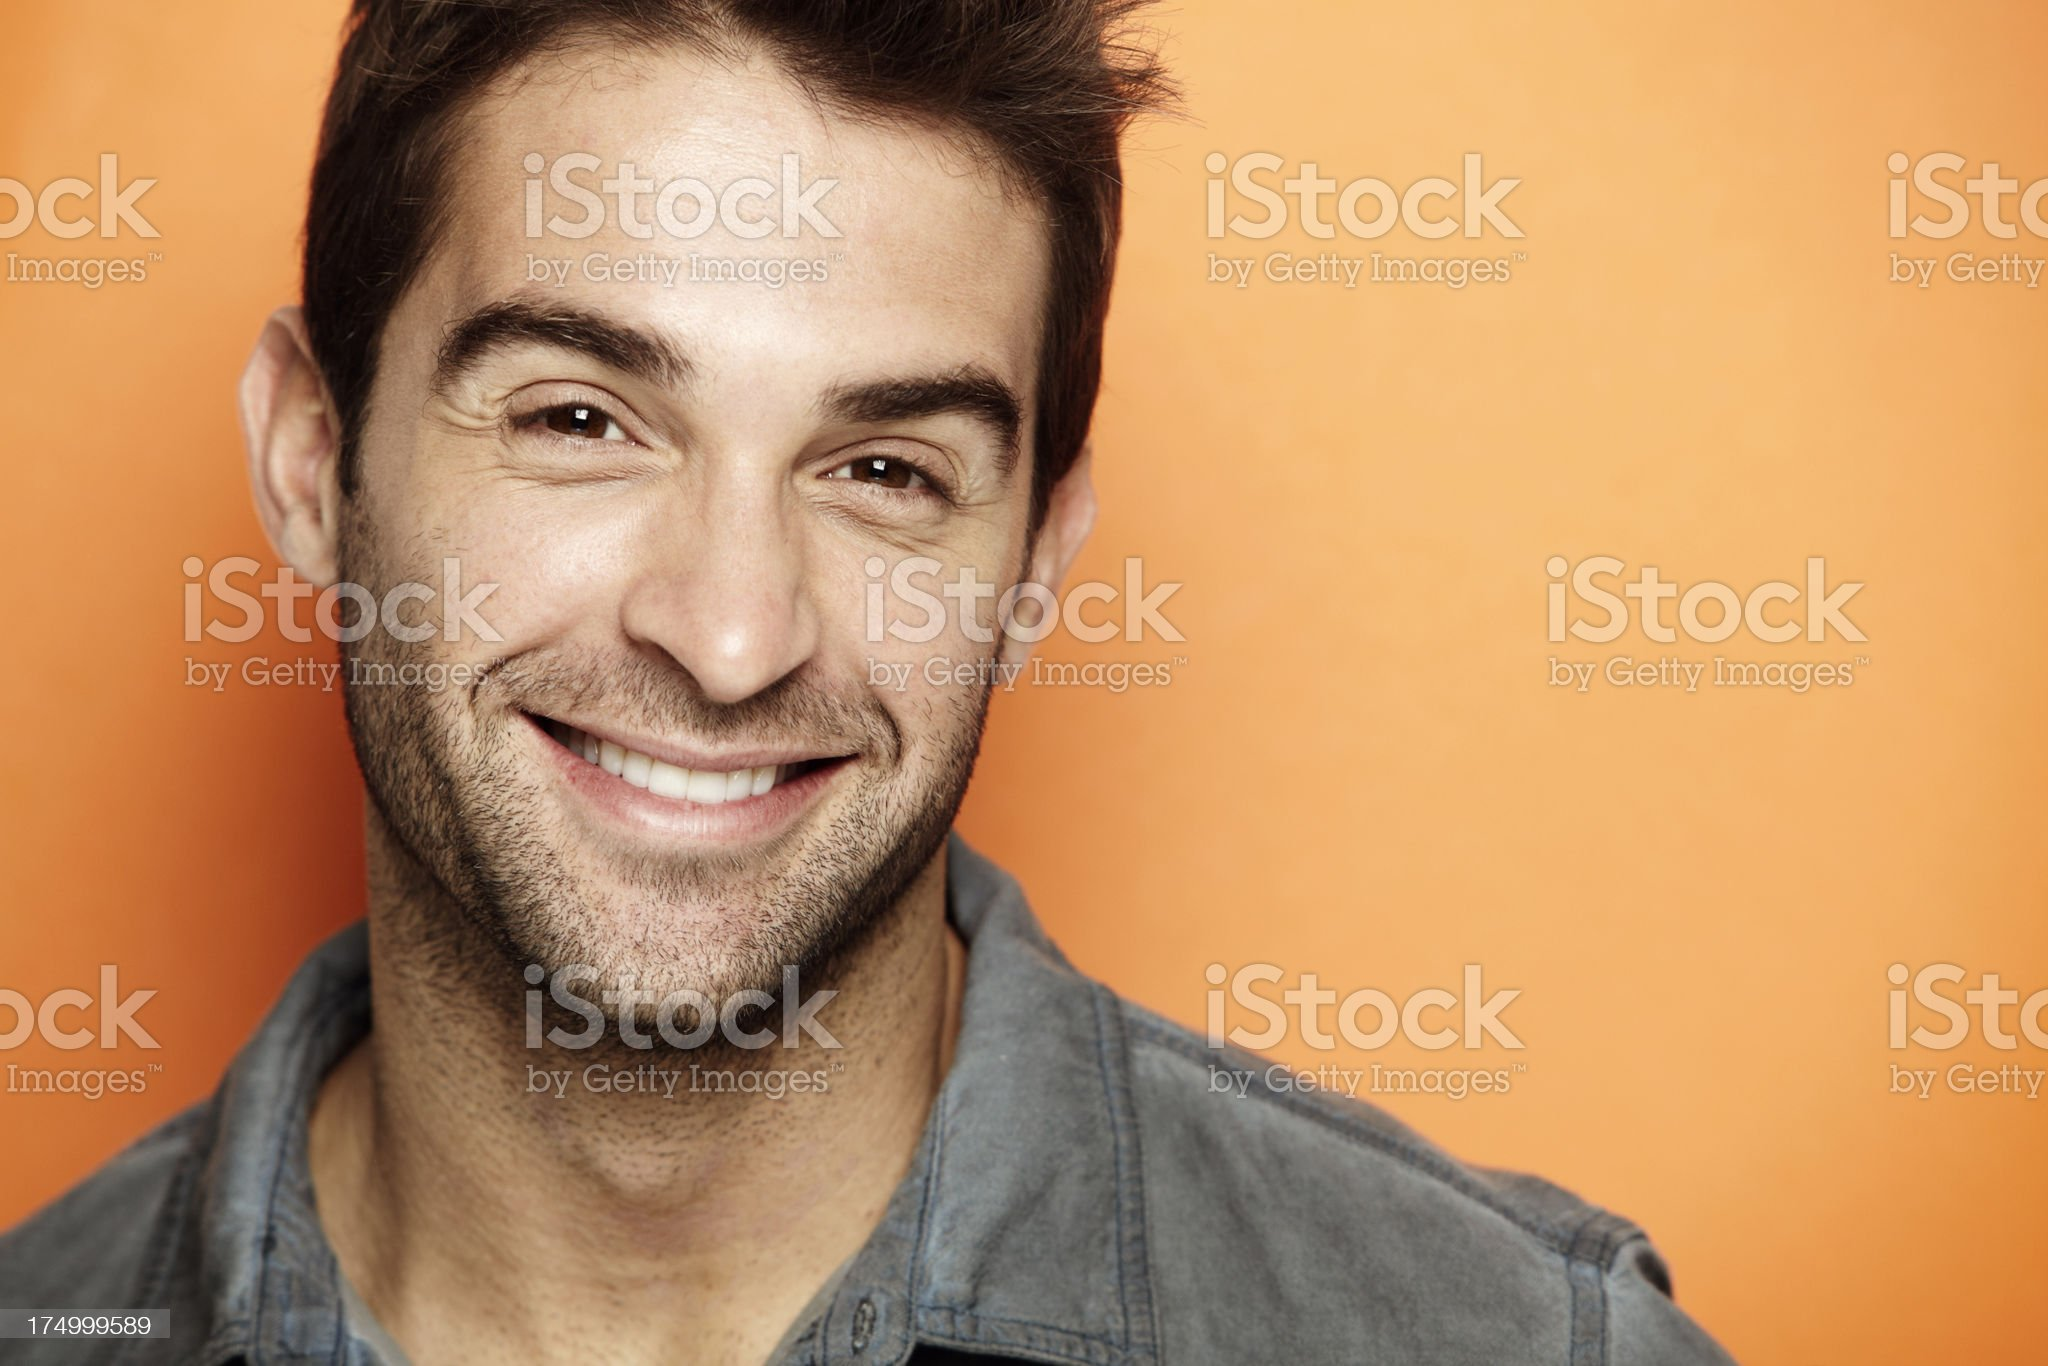 Portrait of mid adult man smiling against orange background royalty-free stock photo